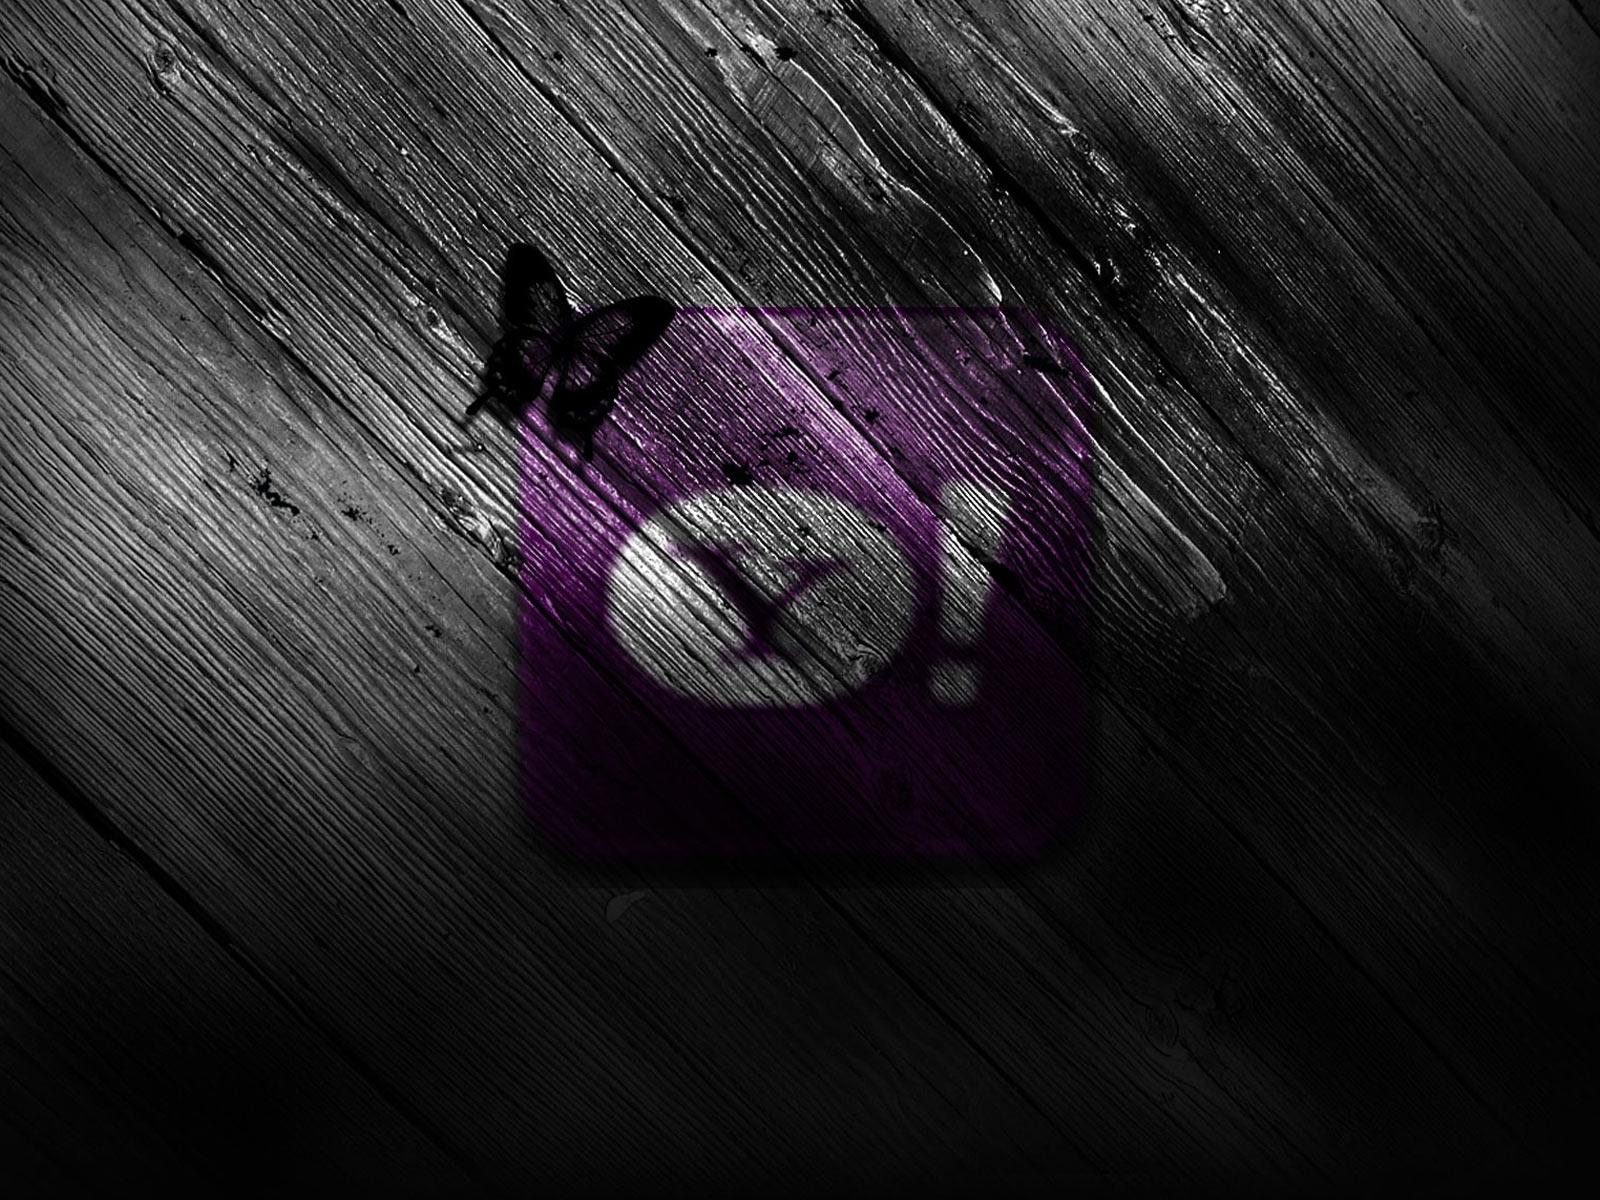 Background image yahoo mail - Jpg 1600x1200 Yahoo Mail Backgrounds